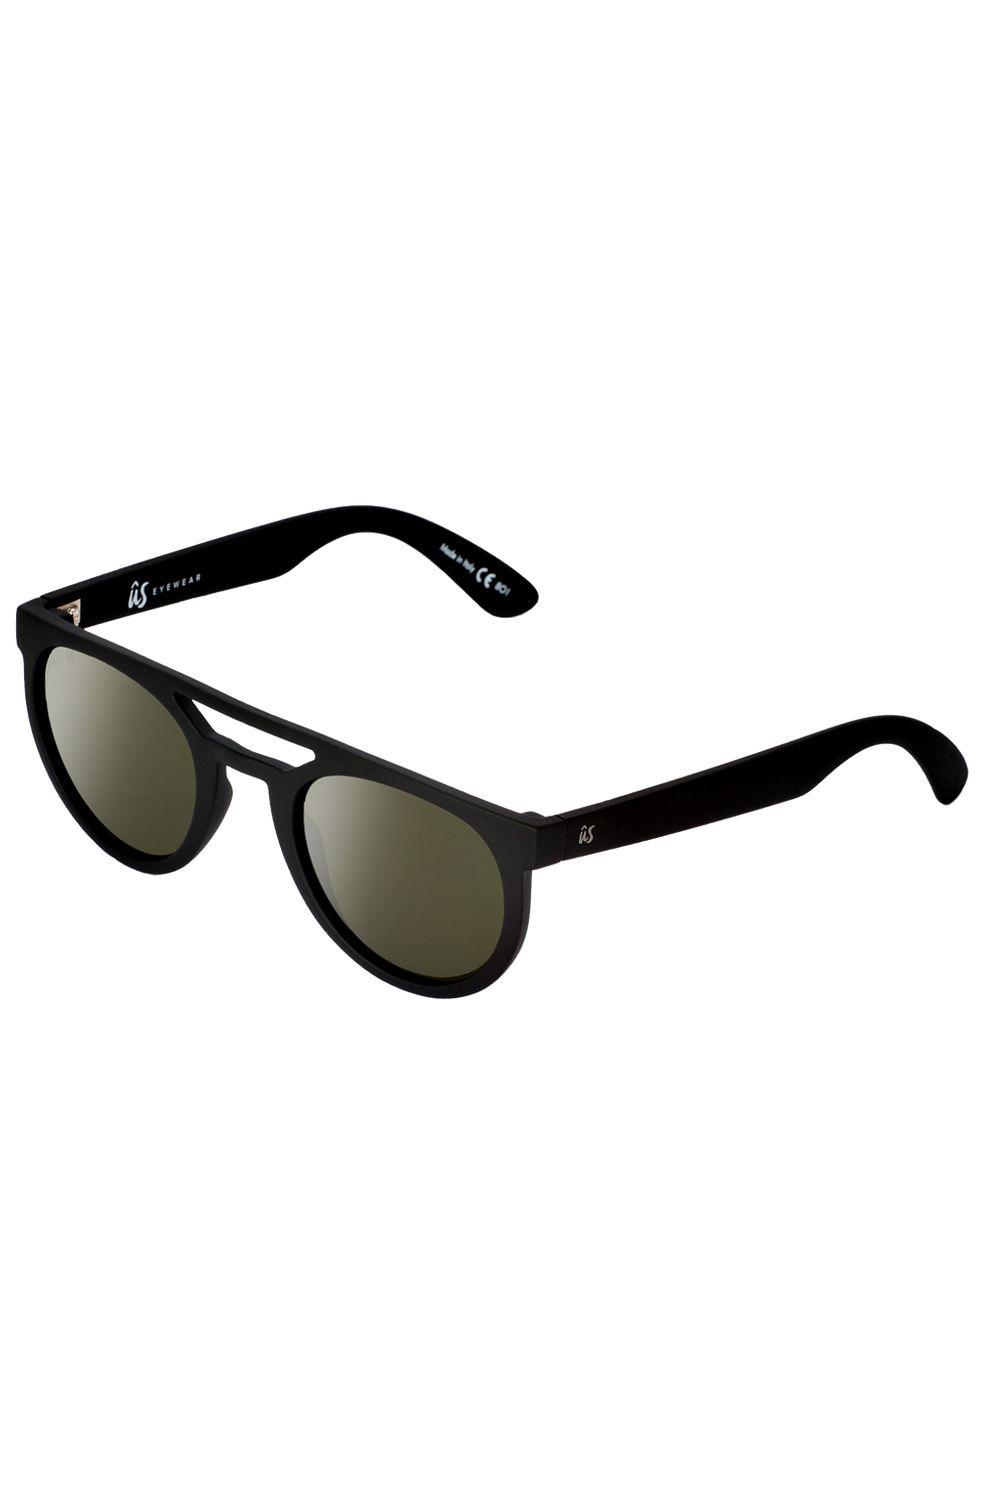 US Sunglasses NEOS Matte Black/Vintage Grey Polarized